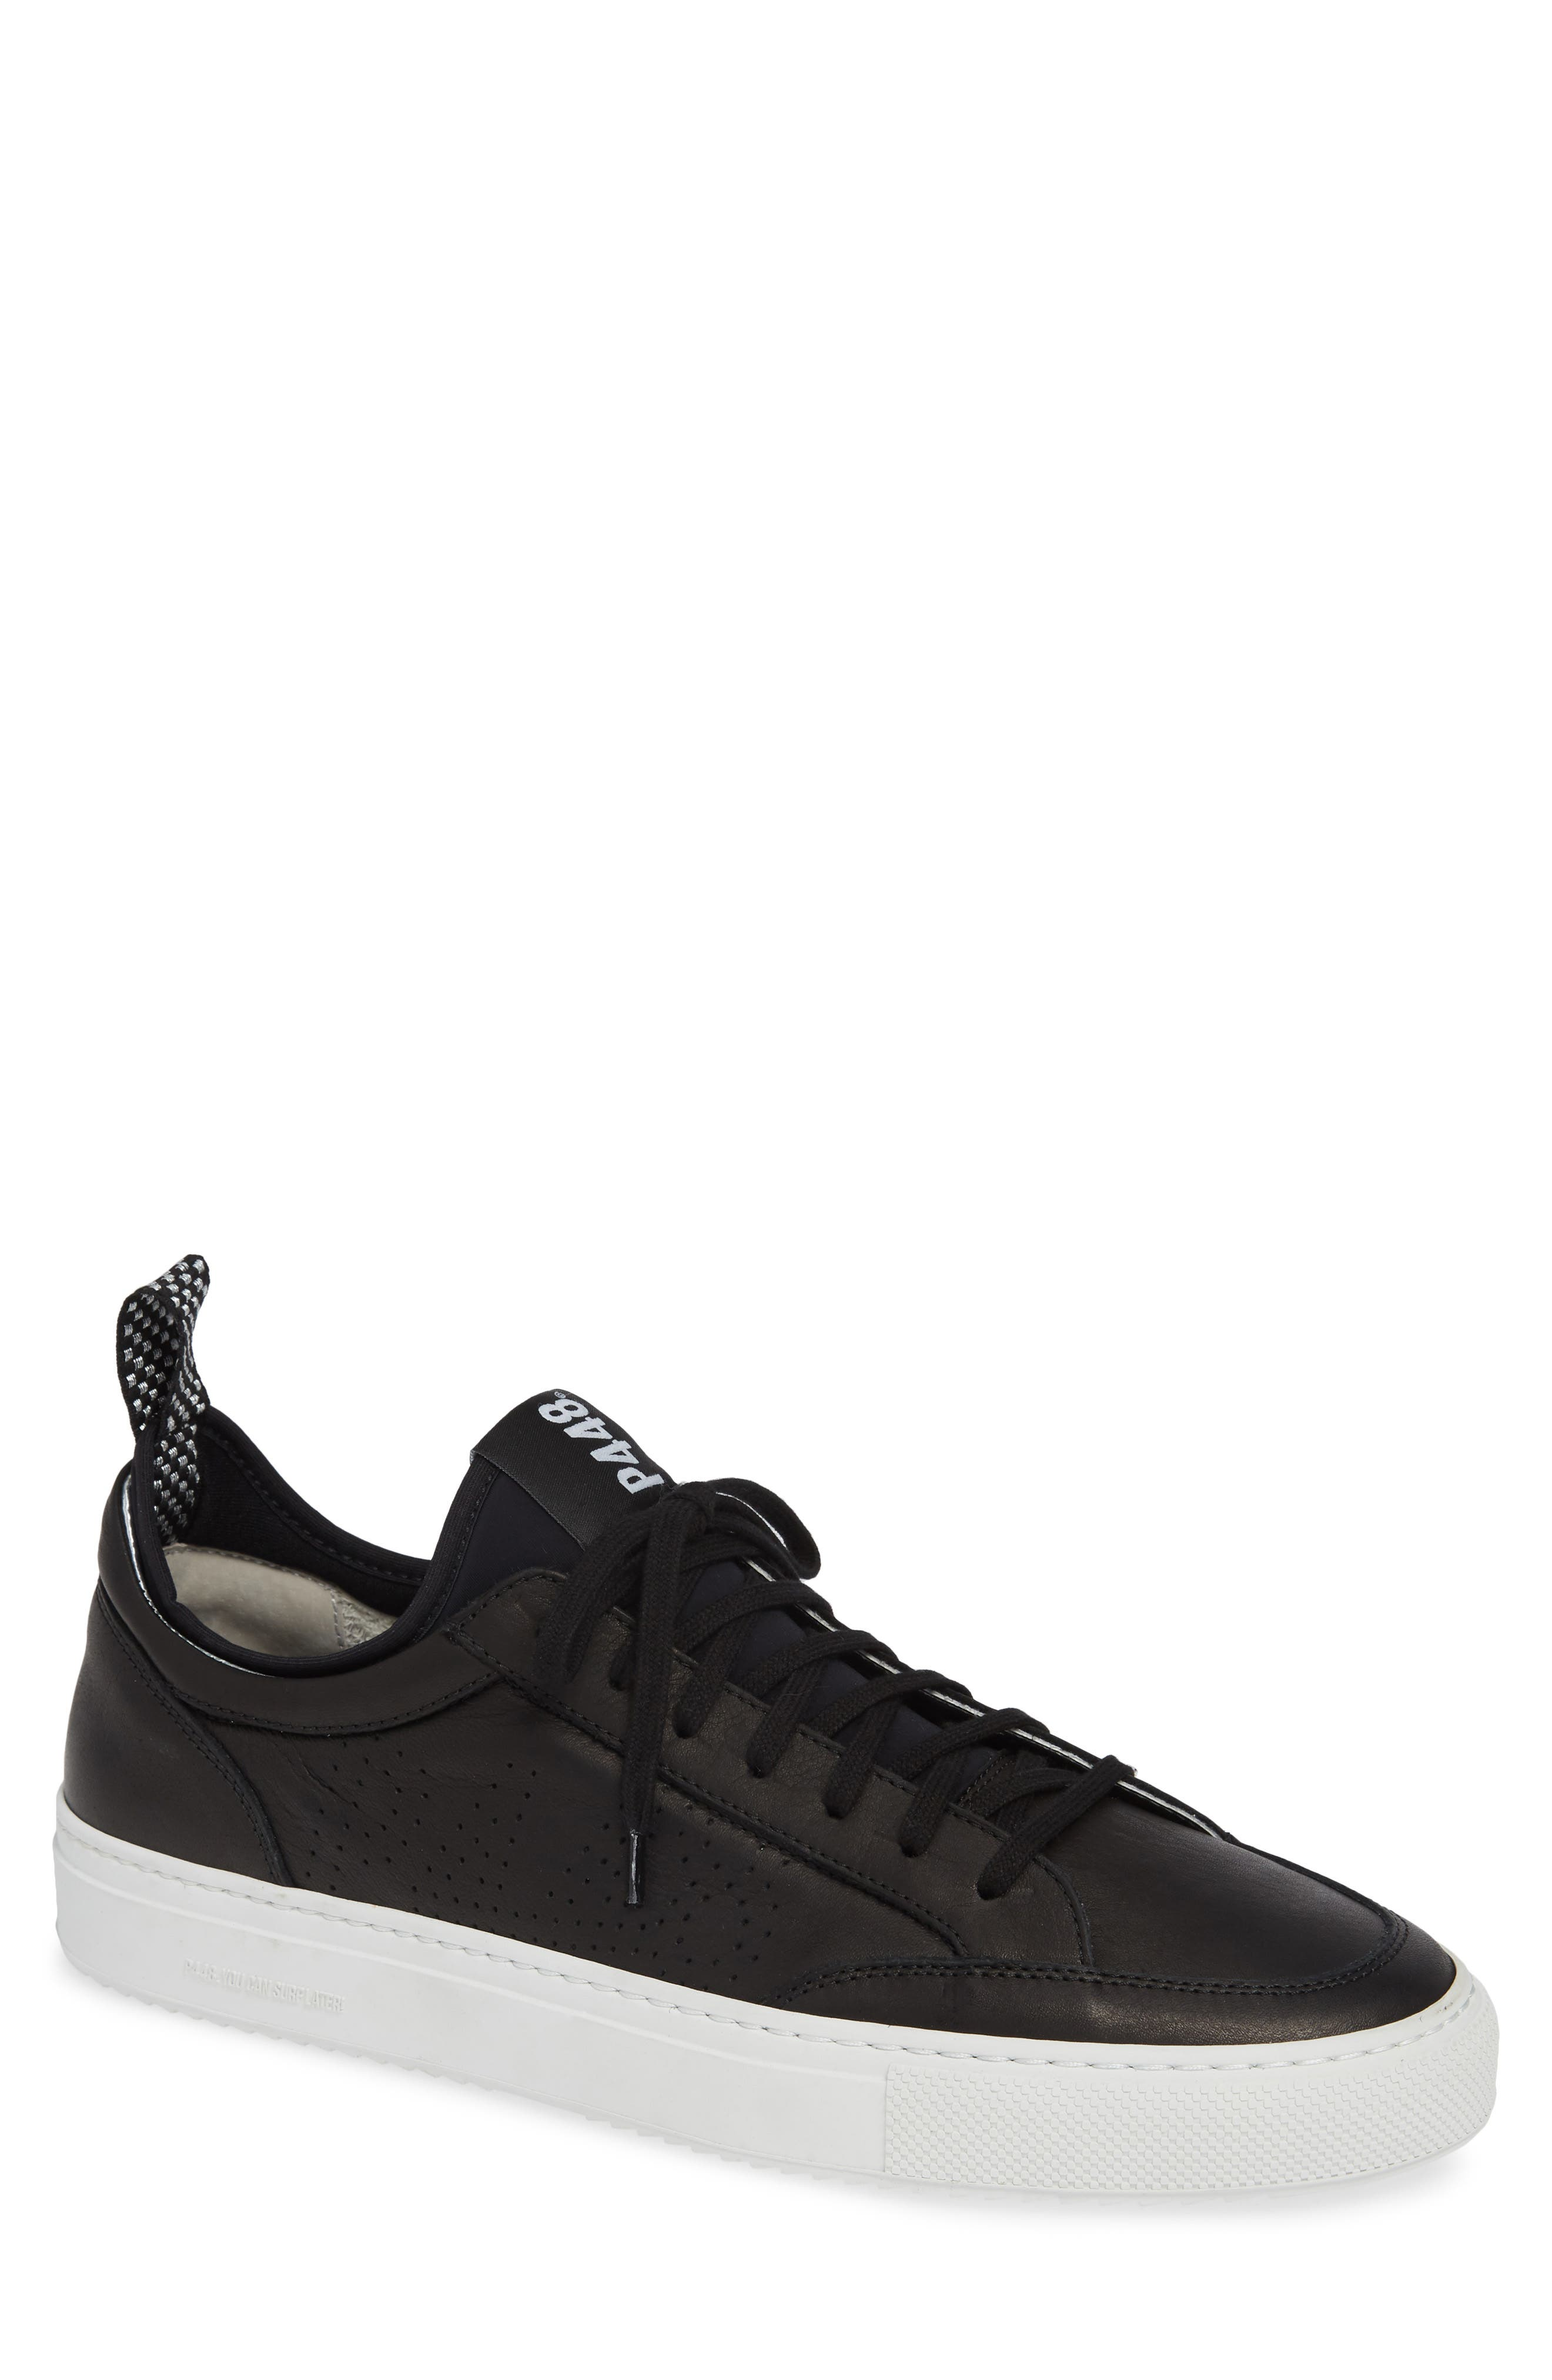 Absohosocks Sneaker,                             Main thumbnail 1, color,                             BLACK